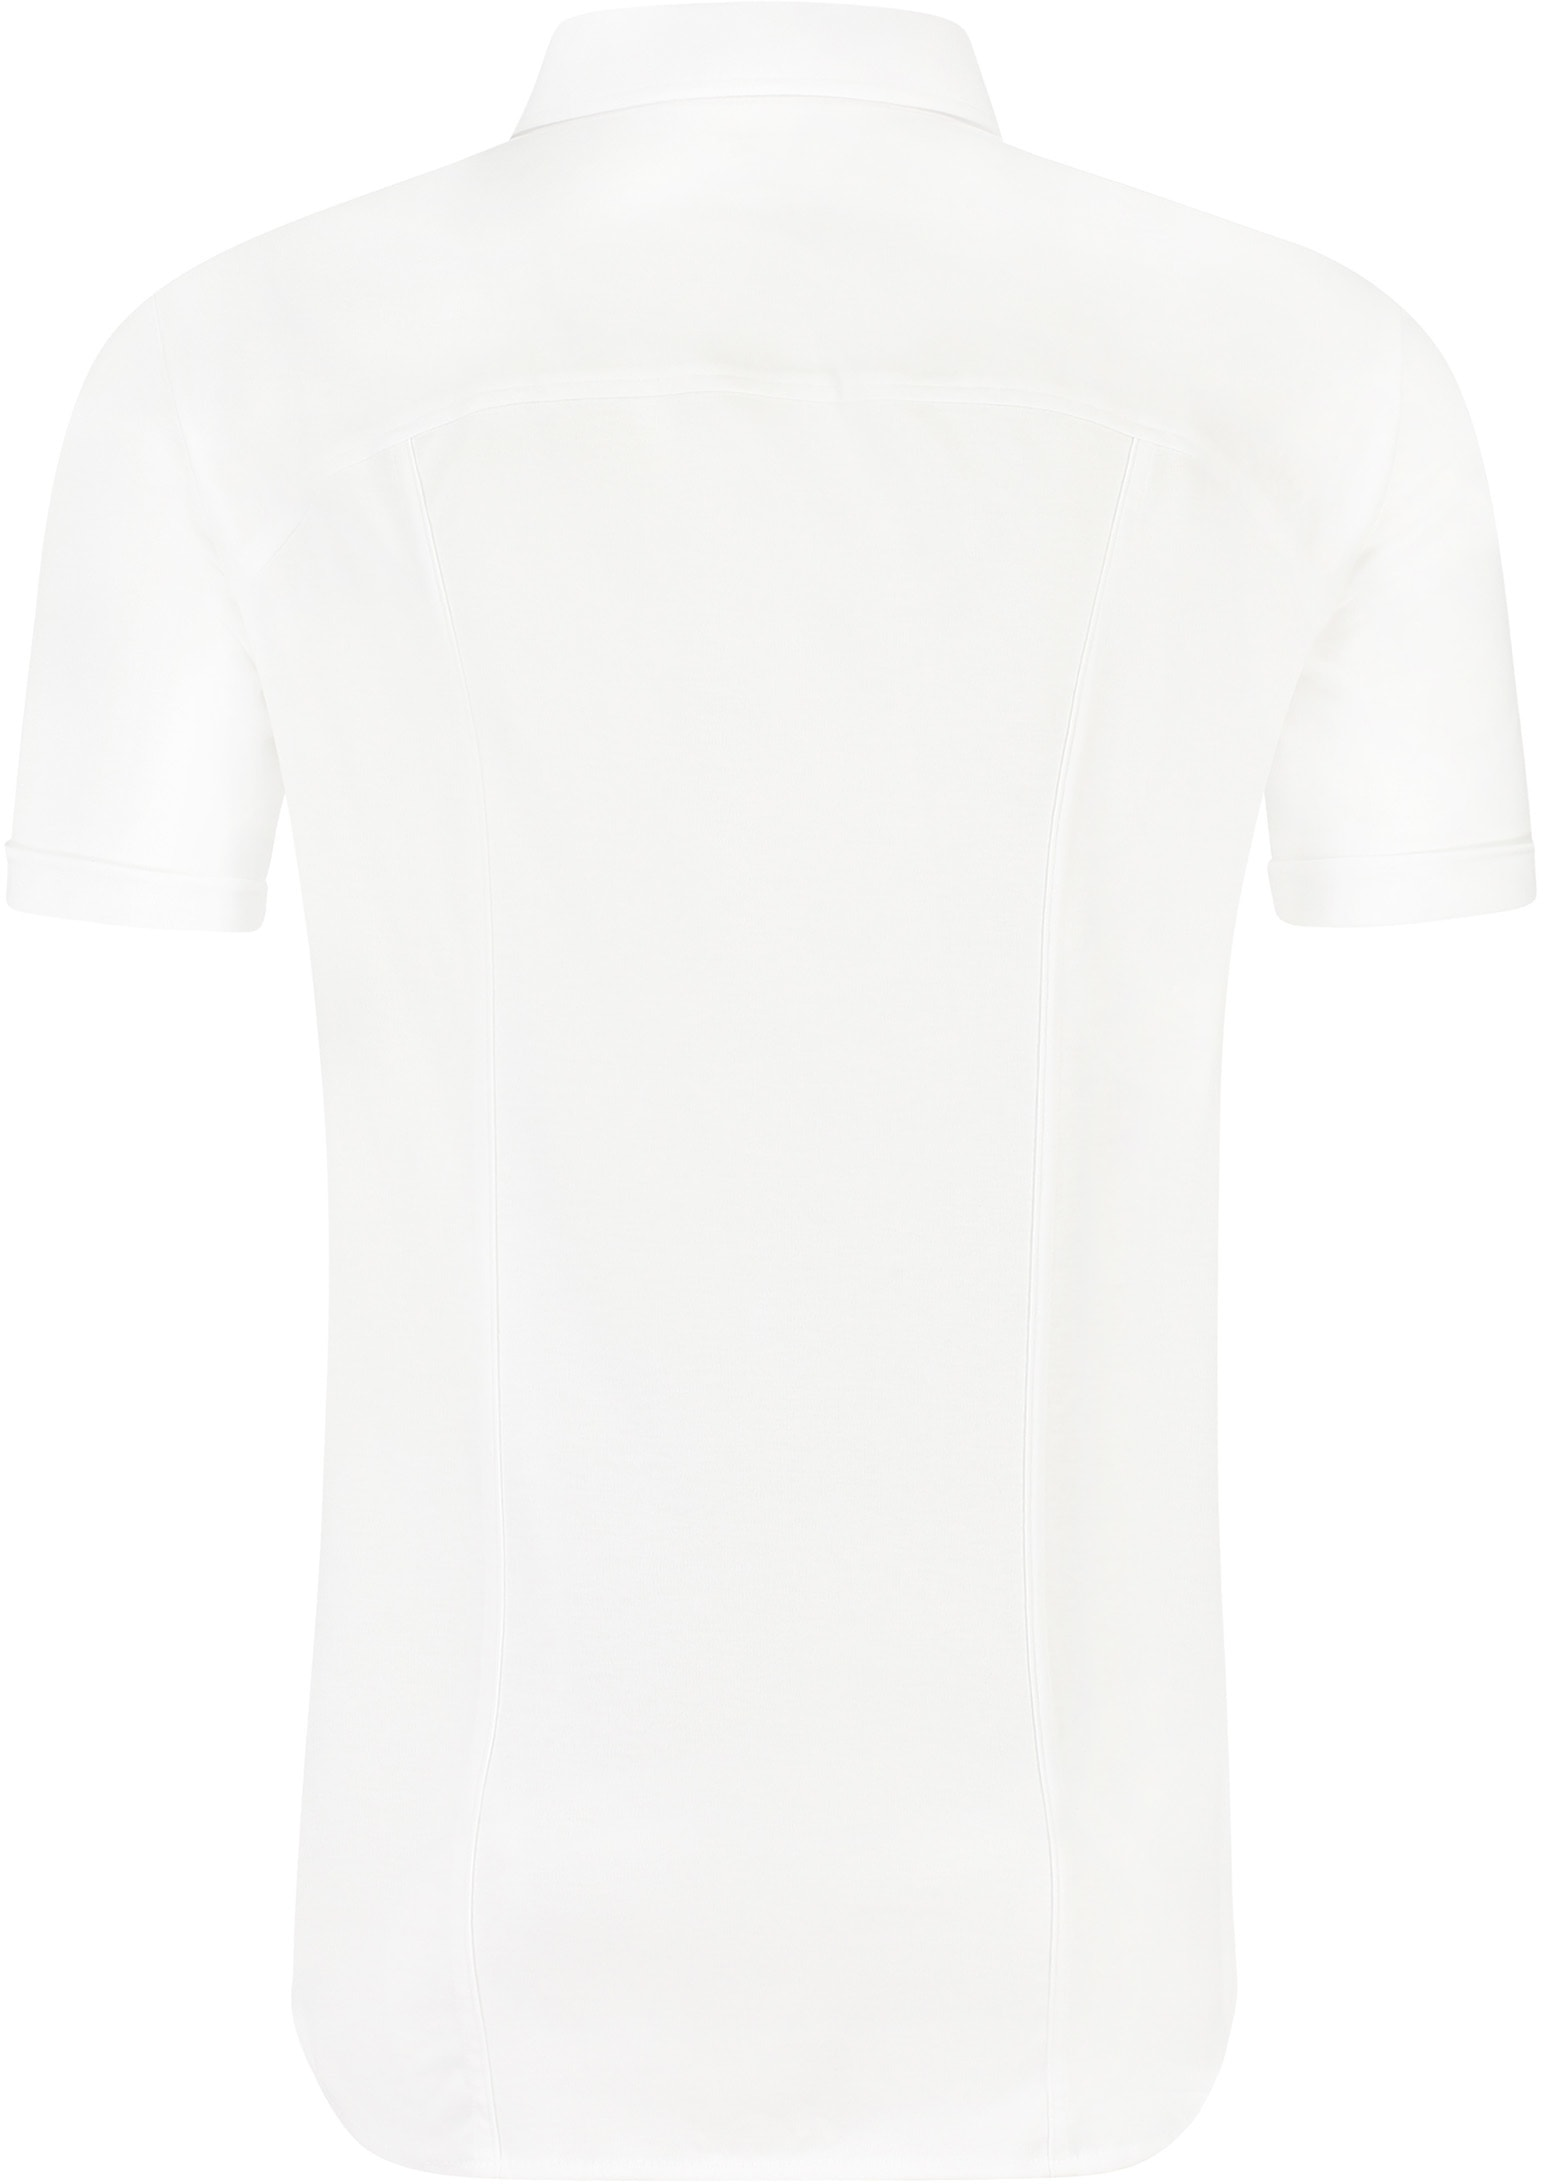 Desoto Shirt Short Sleeve White foto 1